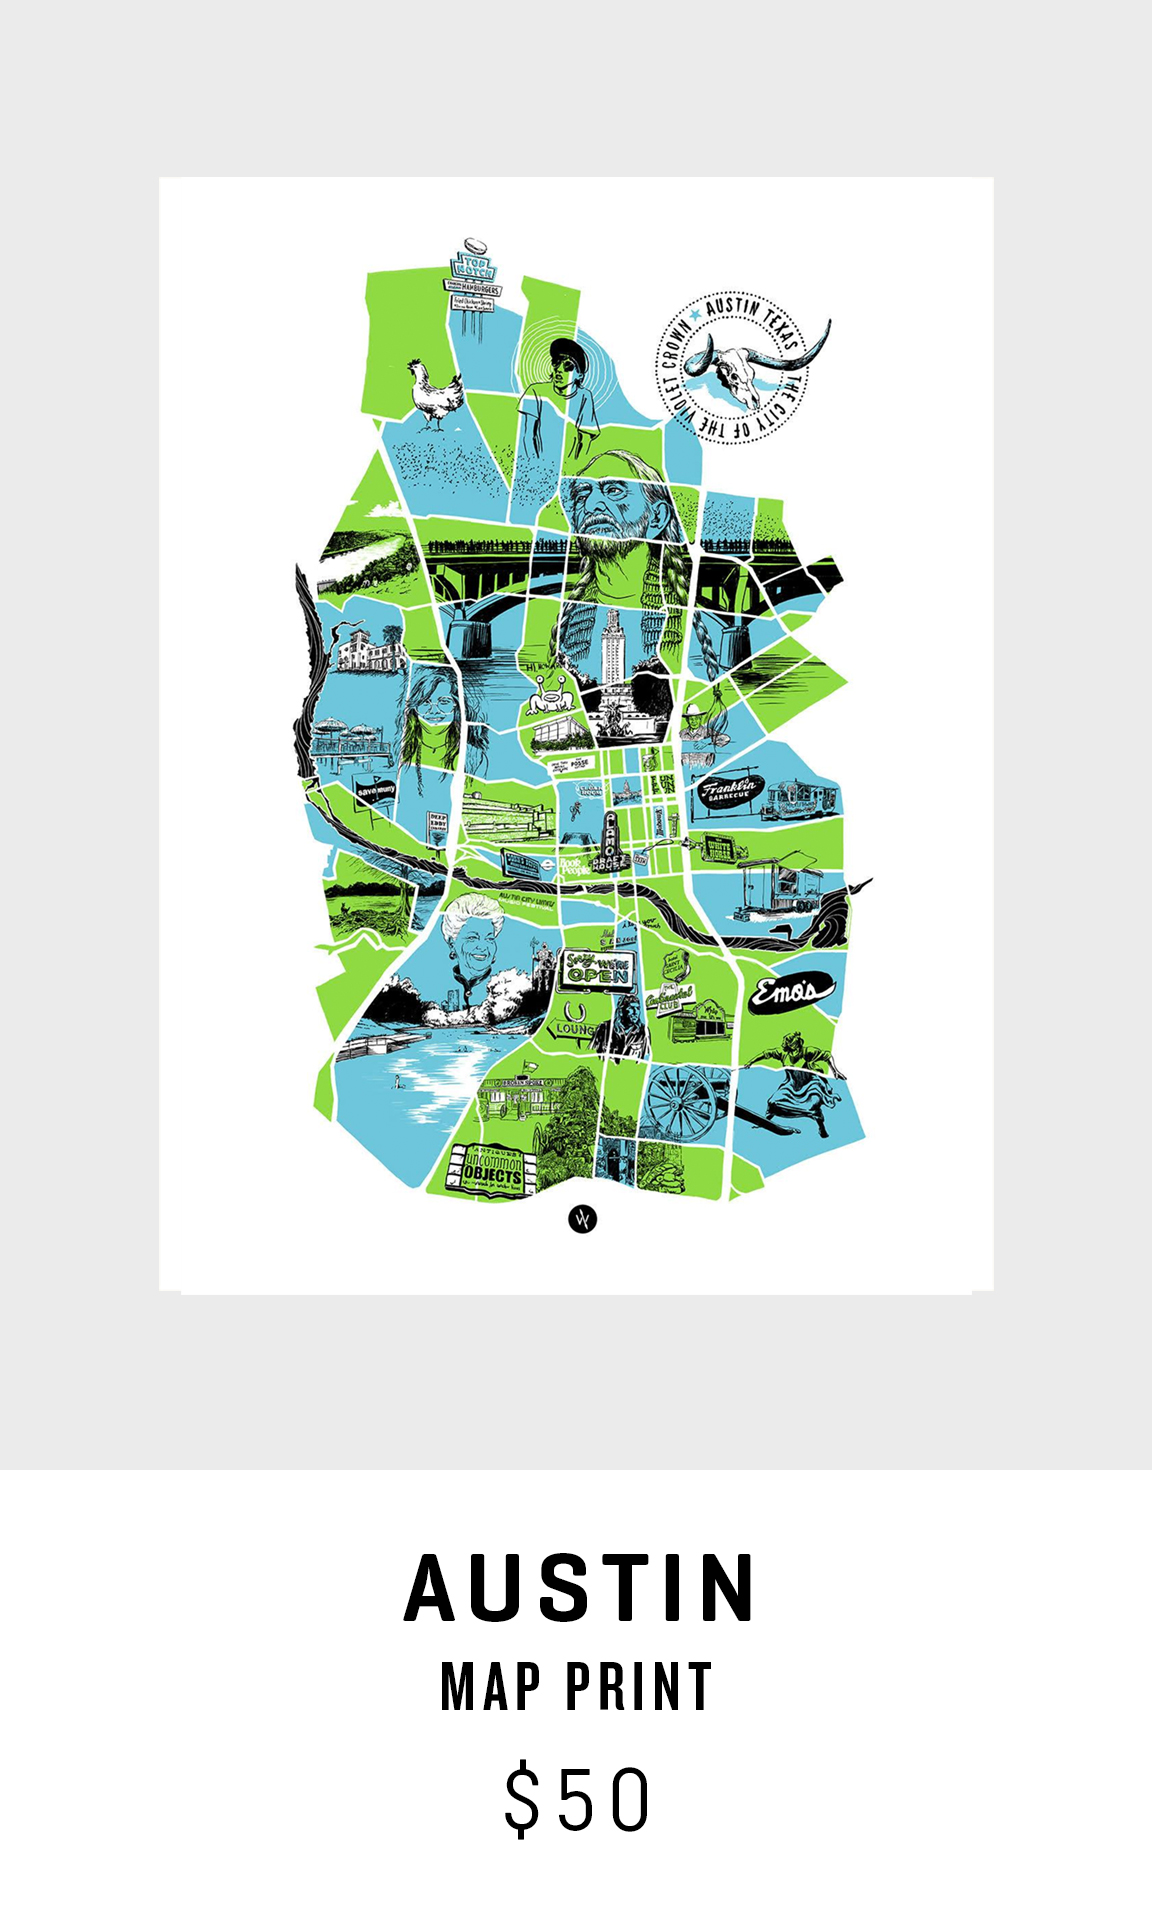 Austin-Map-Print.jpg